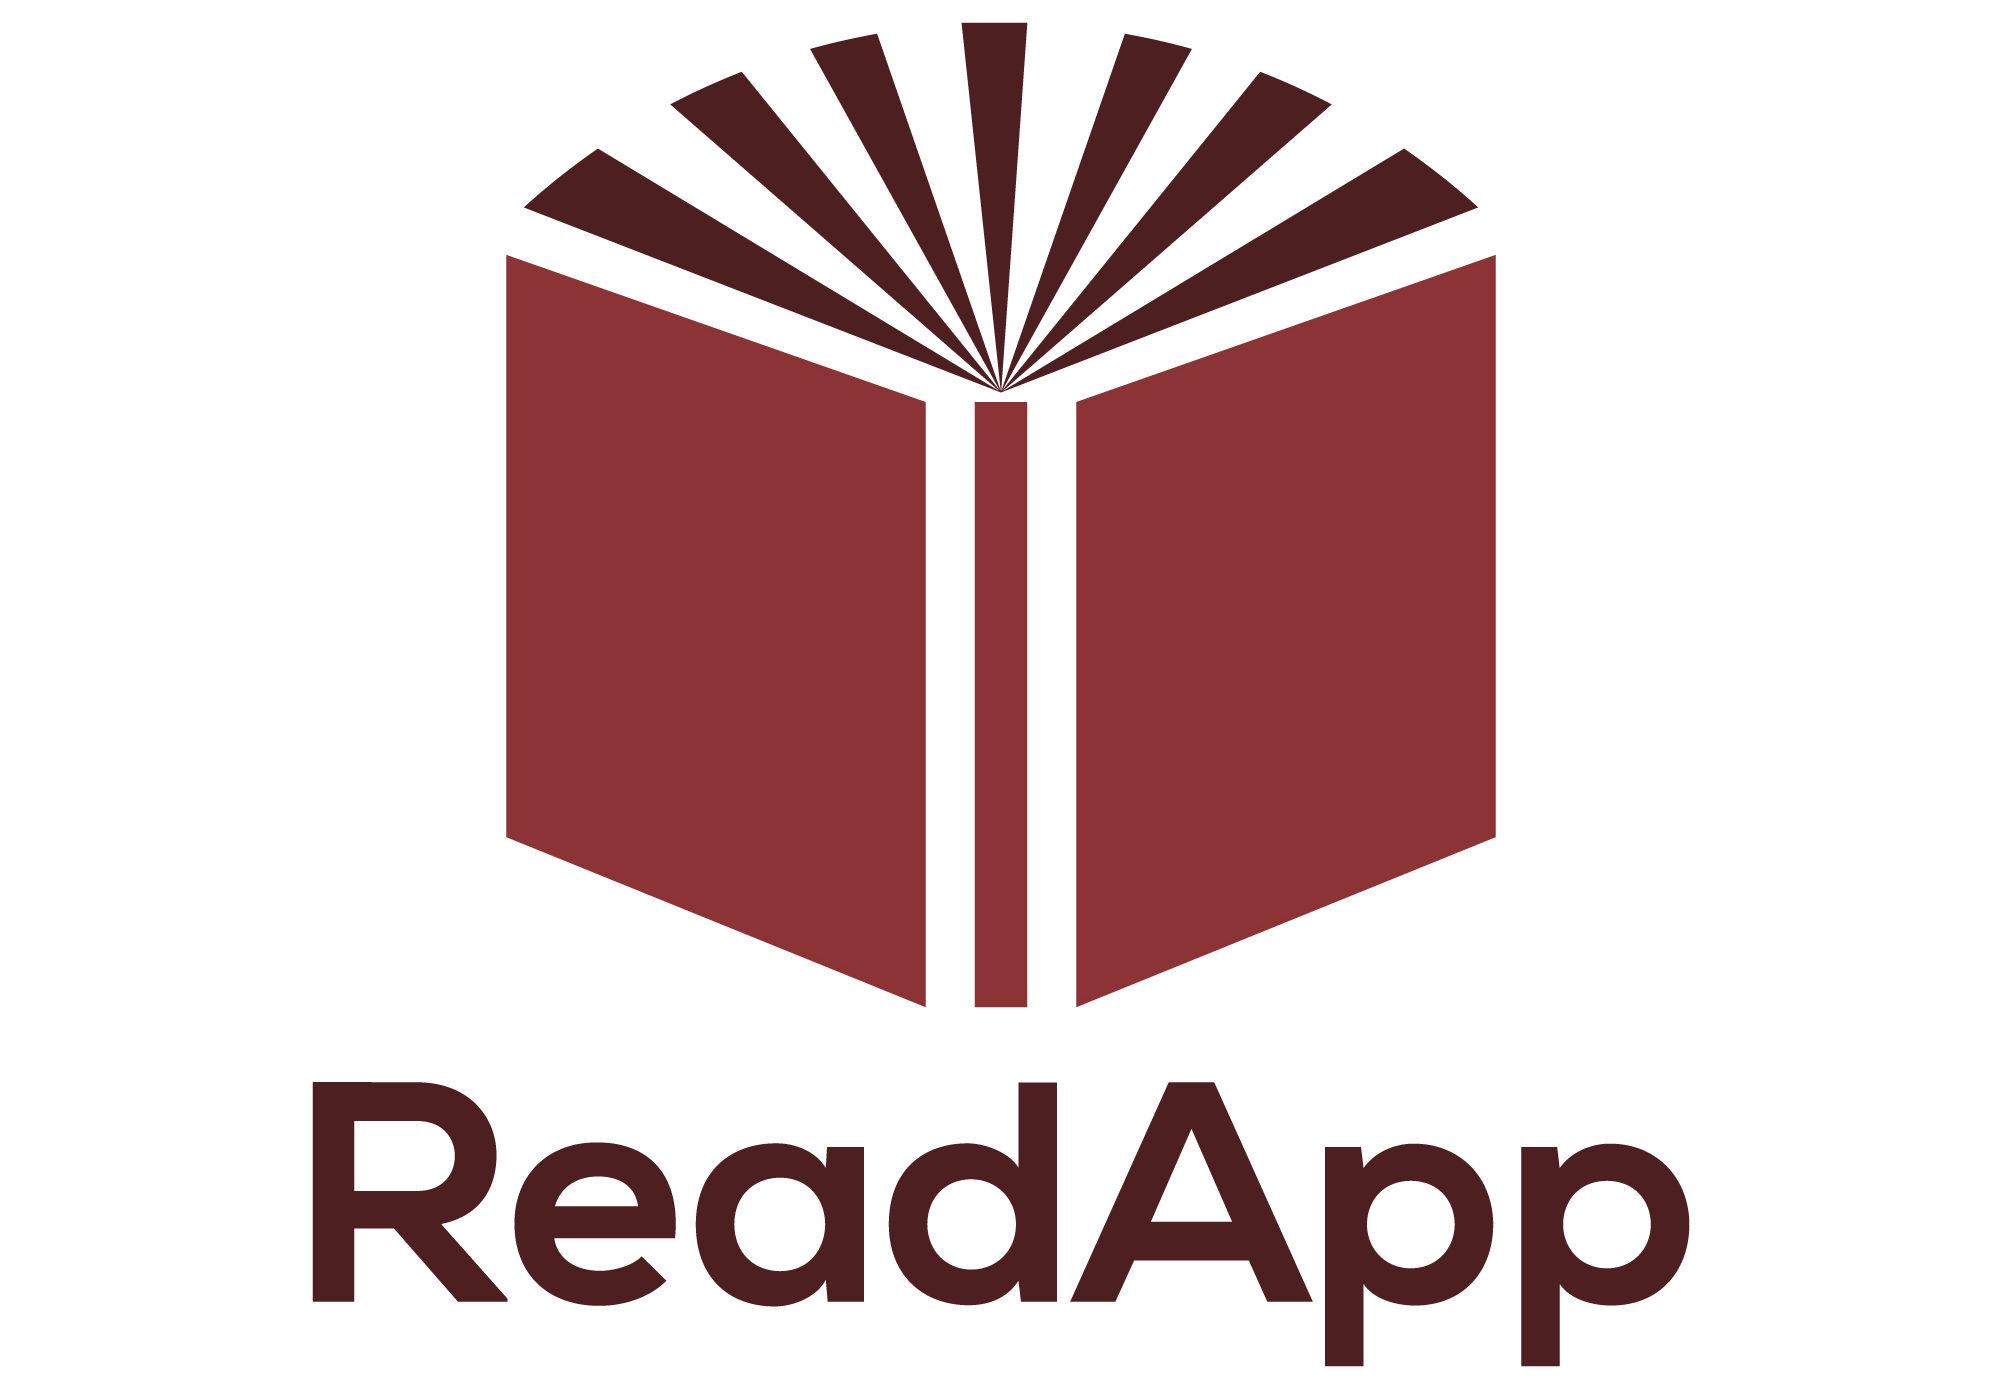 http://readapp.co.uk/wp-content/uploads/2016/12/cropped-c5958_ReadApp_LOGO_KJ.jpg